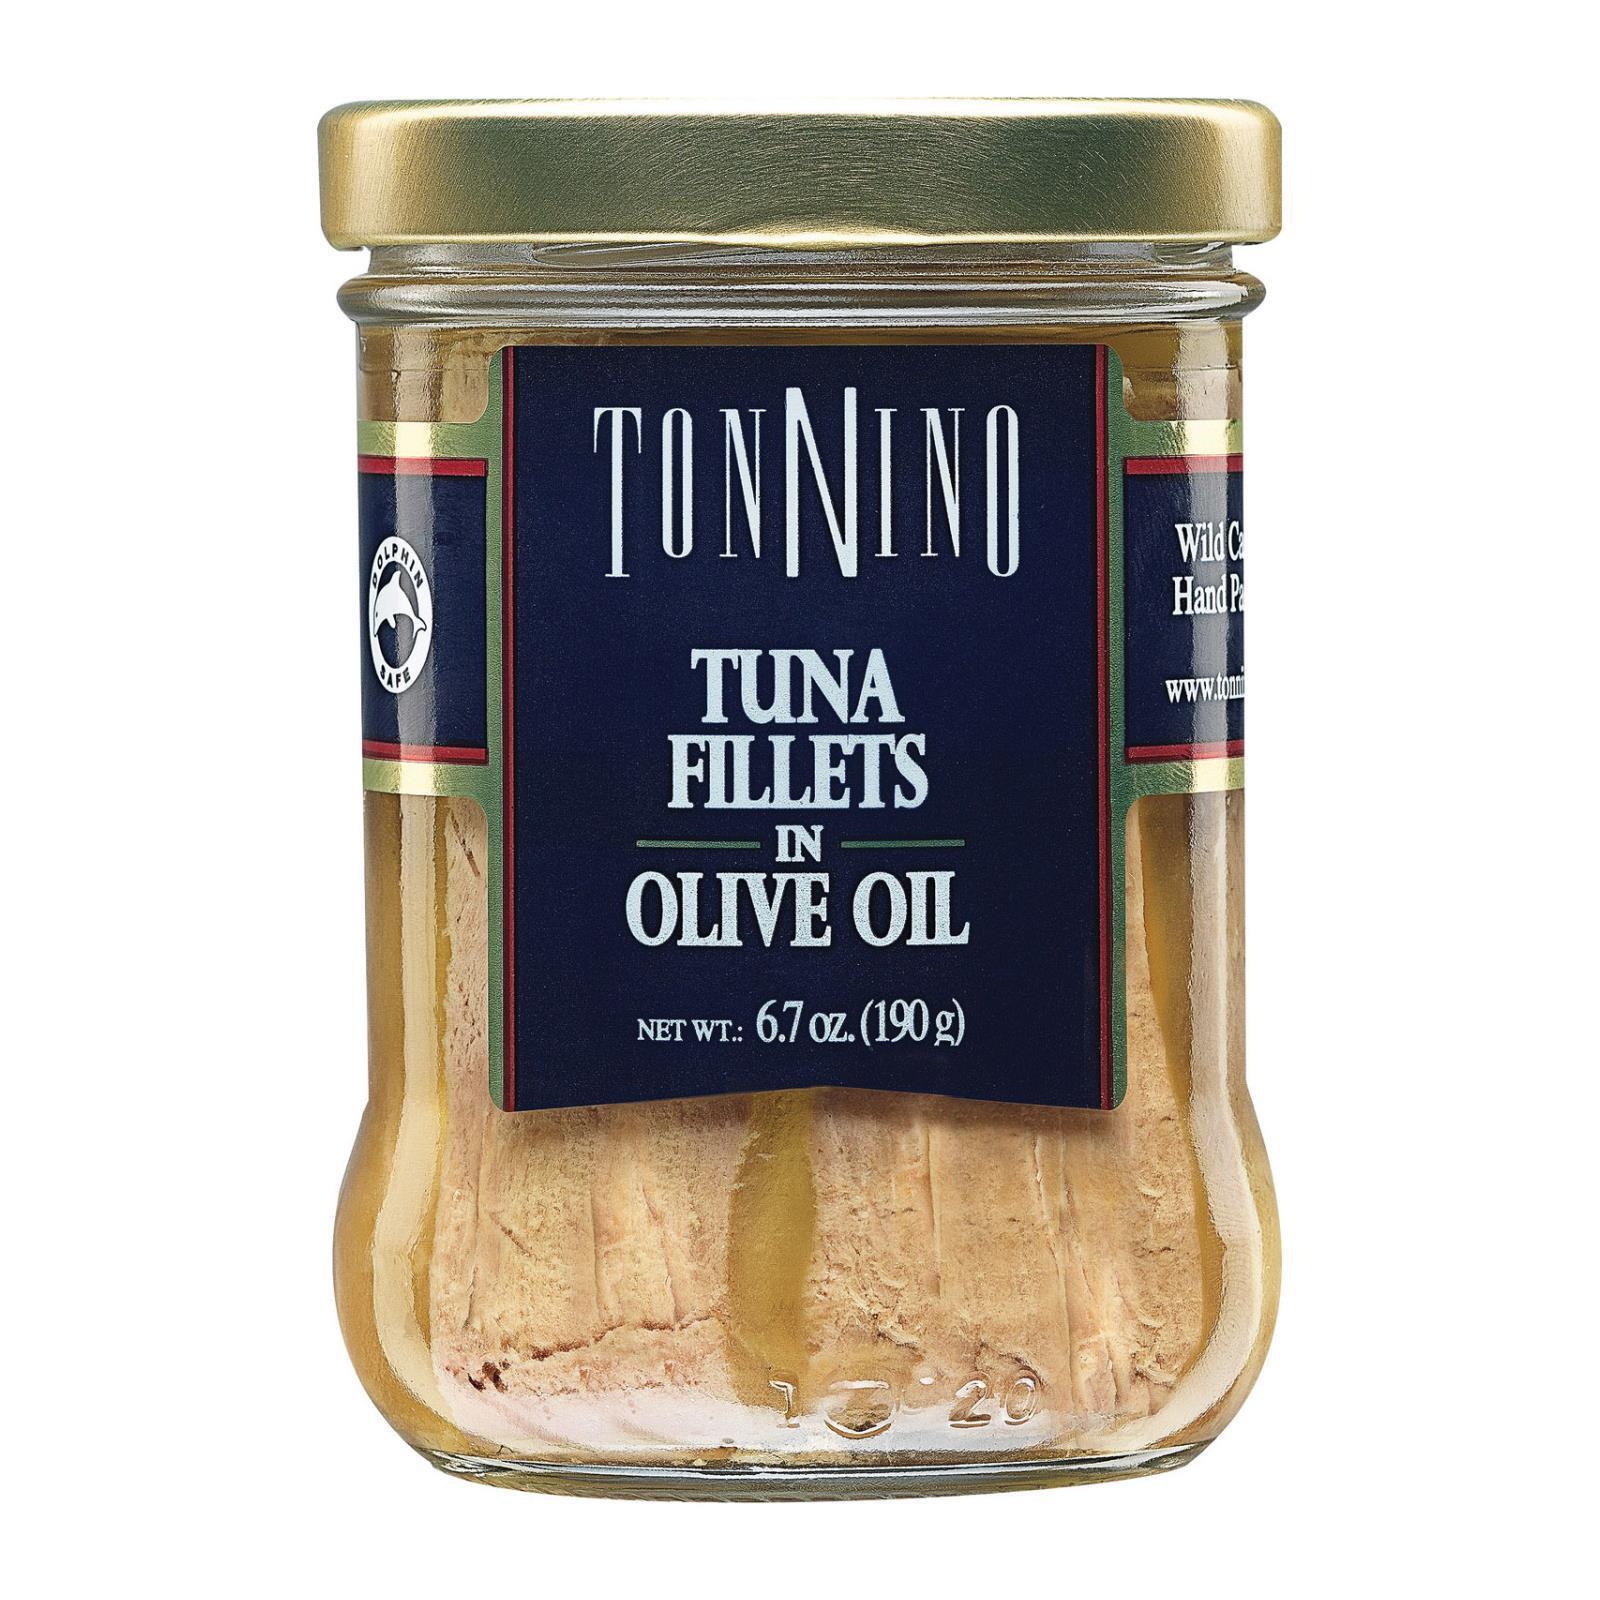 Tonnino Tuna Fillets - Olive Oil - Case of 6 - 6.7 oz.